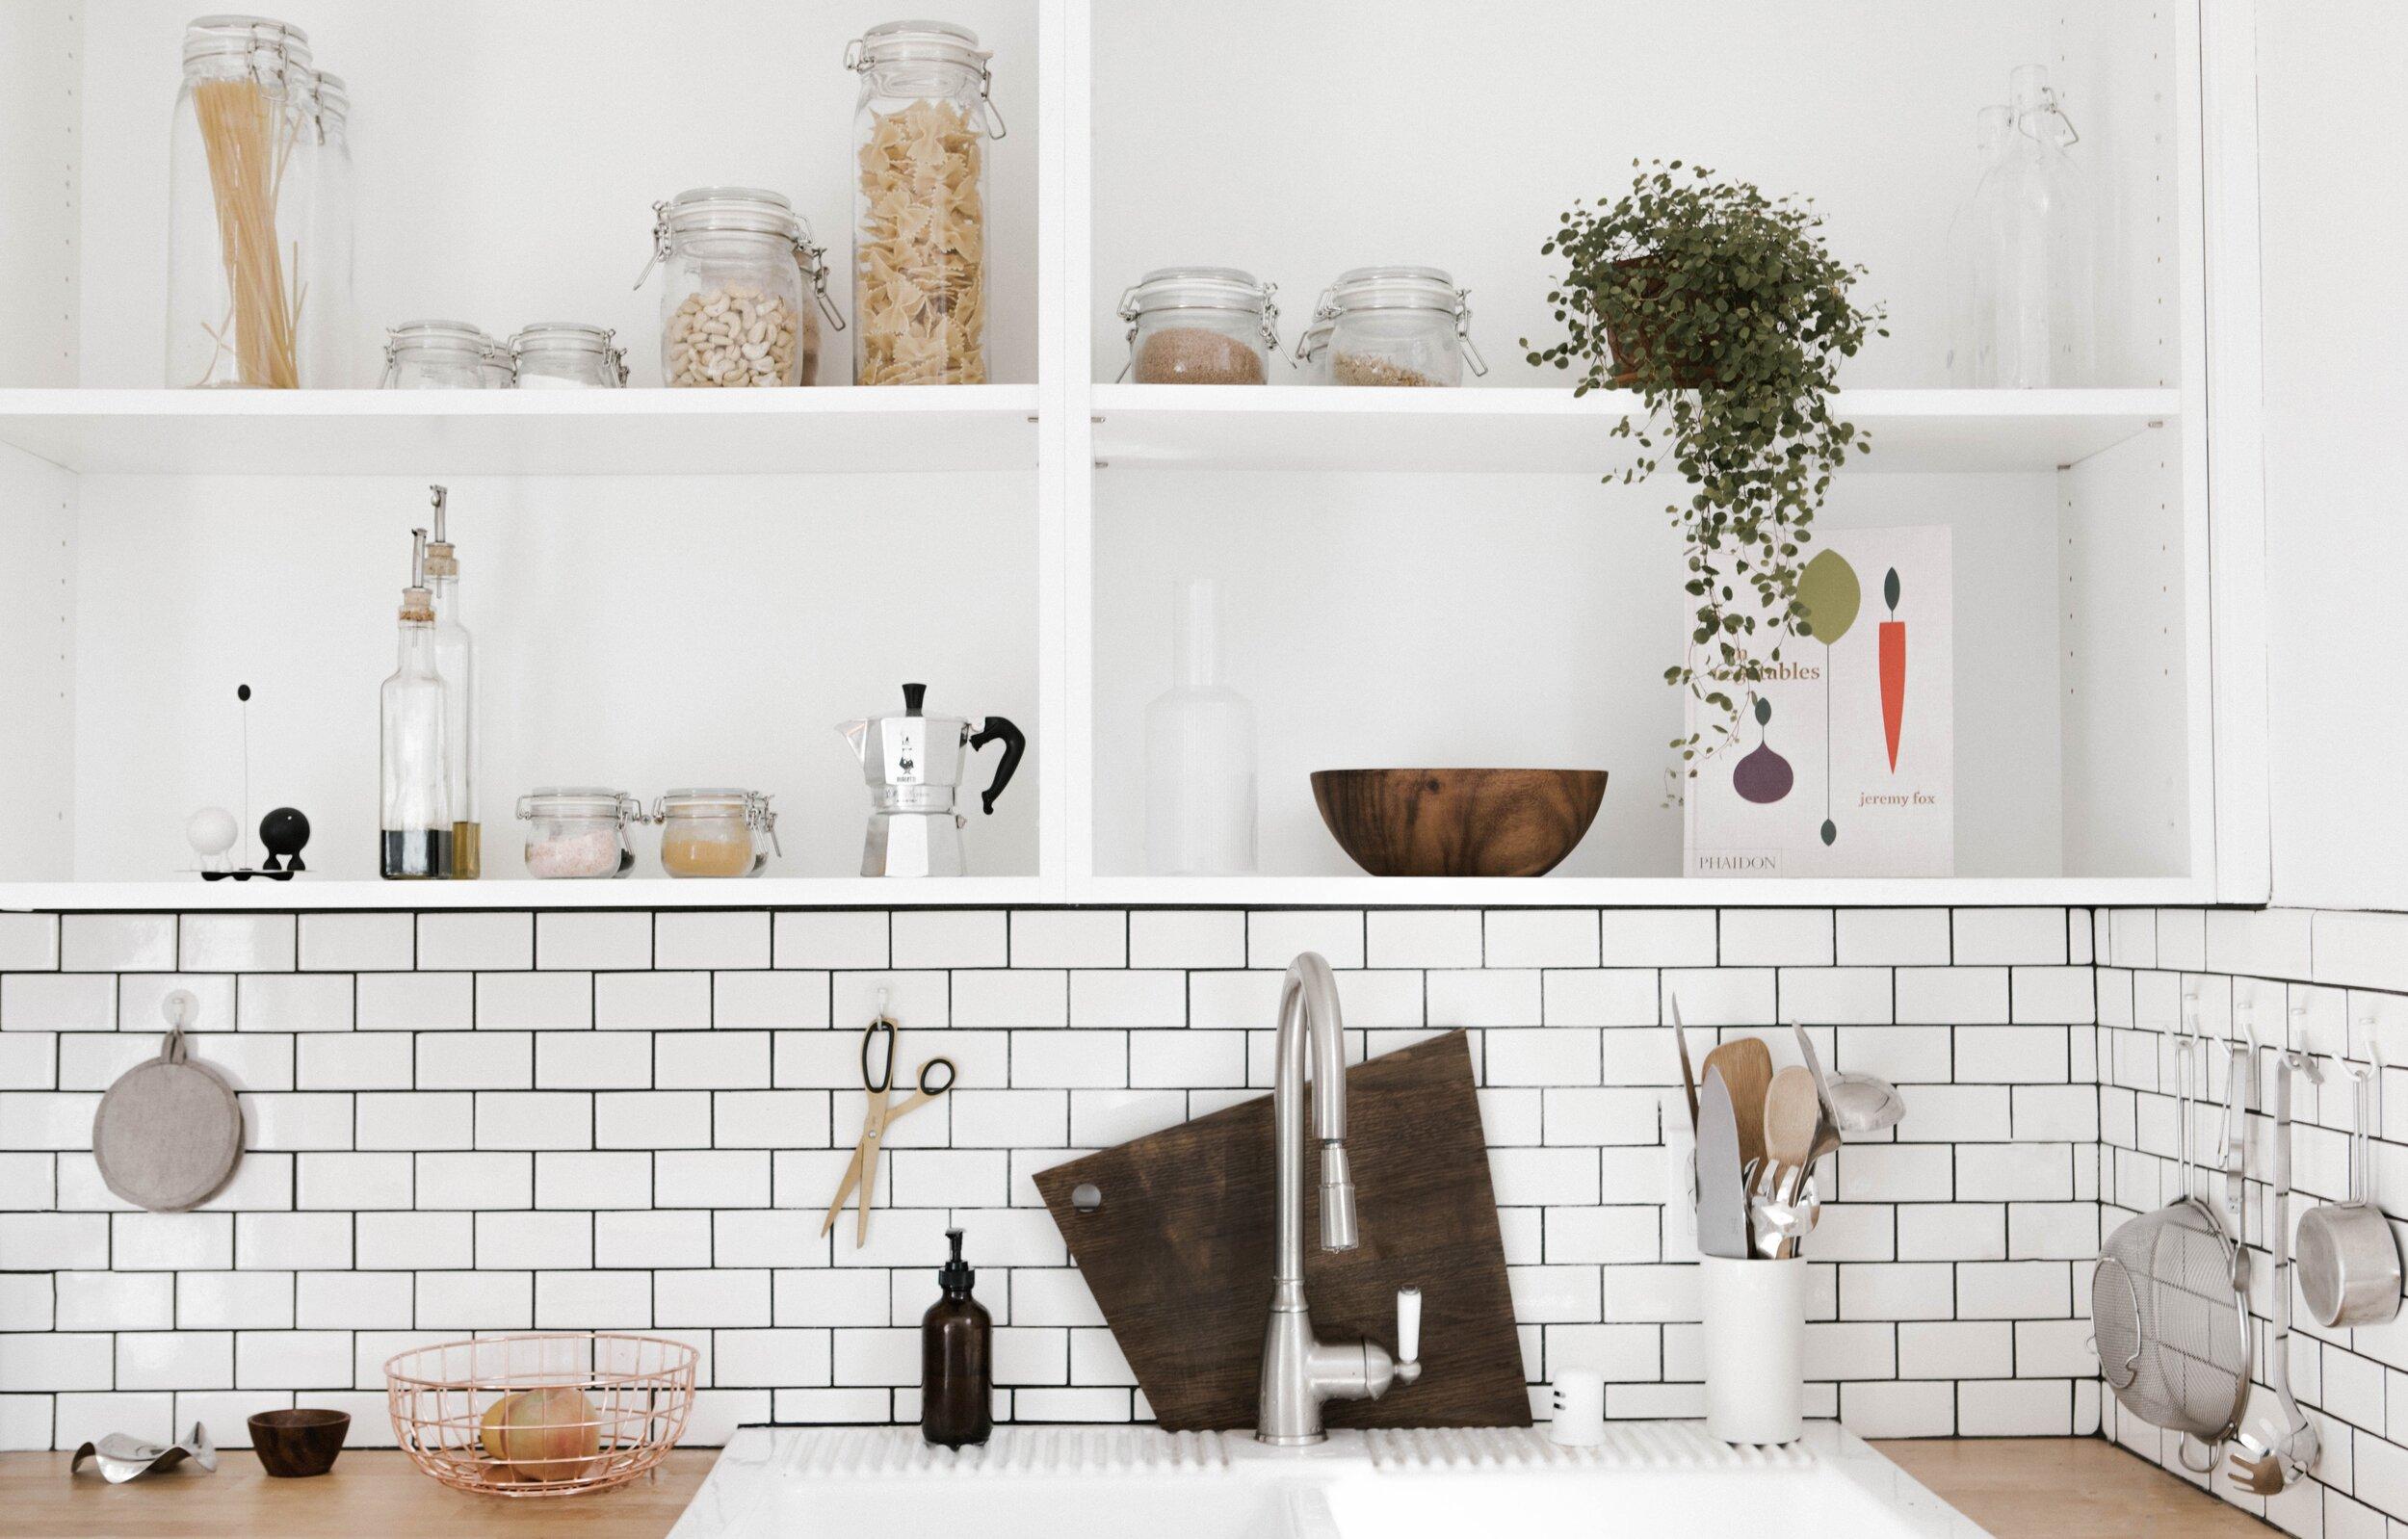 Kitchen Shelves.jpg